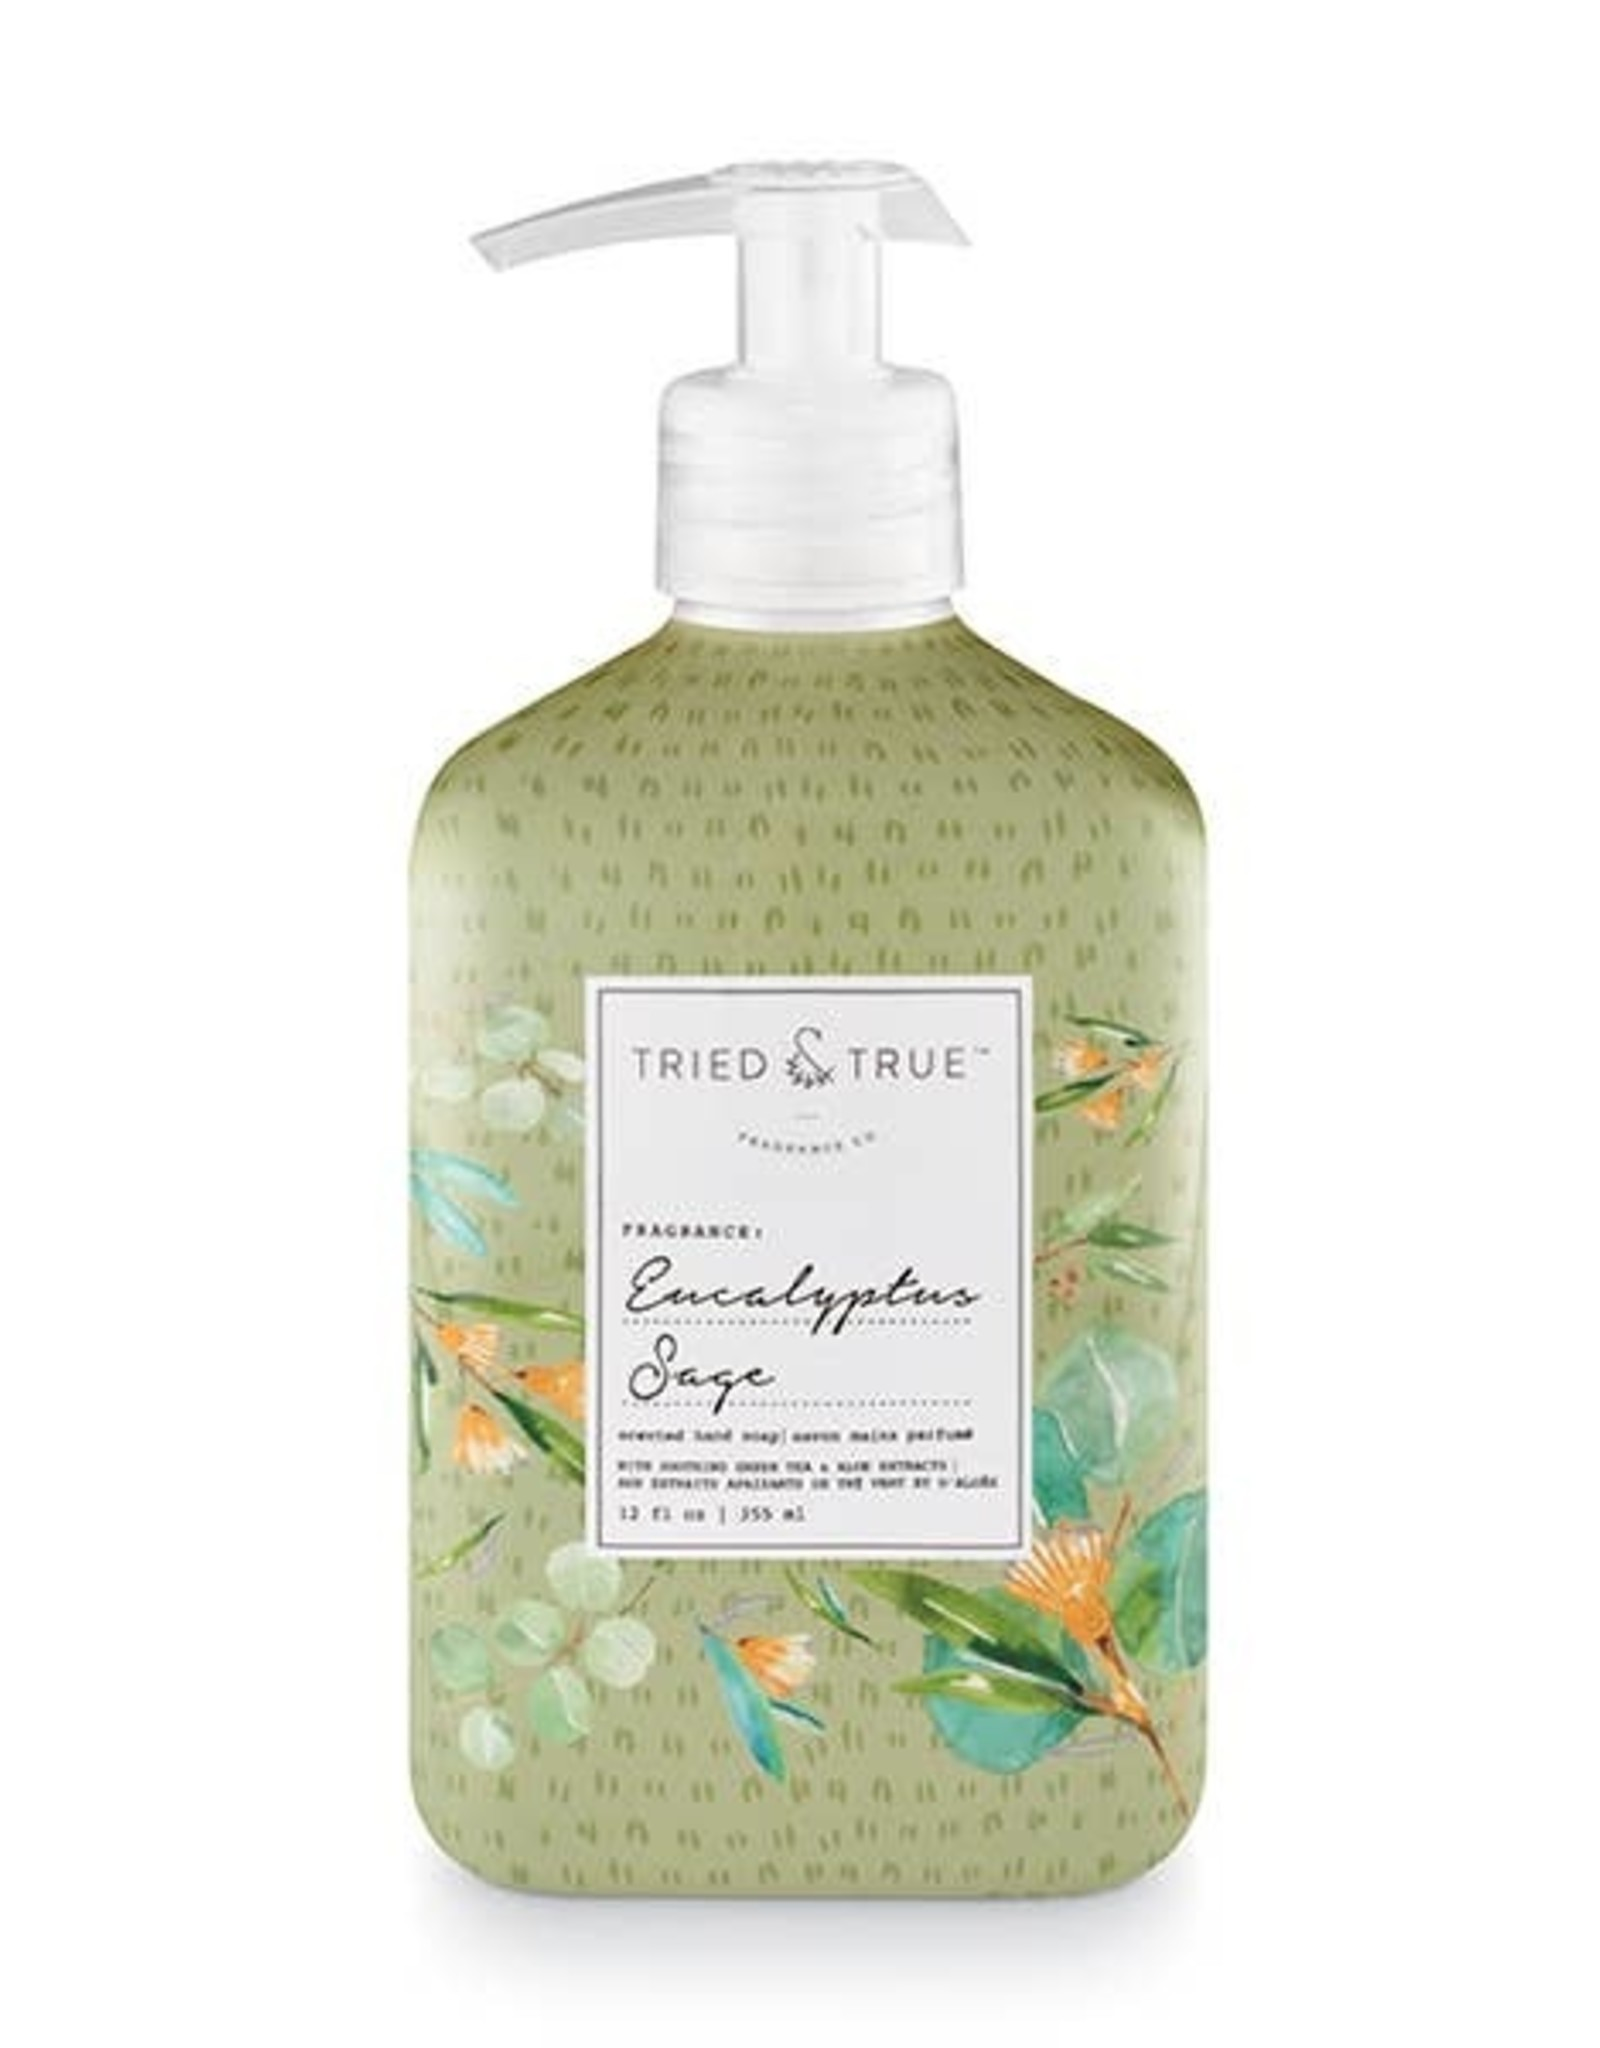 Tried & True Tried & True   Eucalyptus & Sage Hand Wash